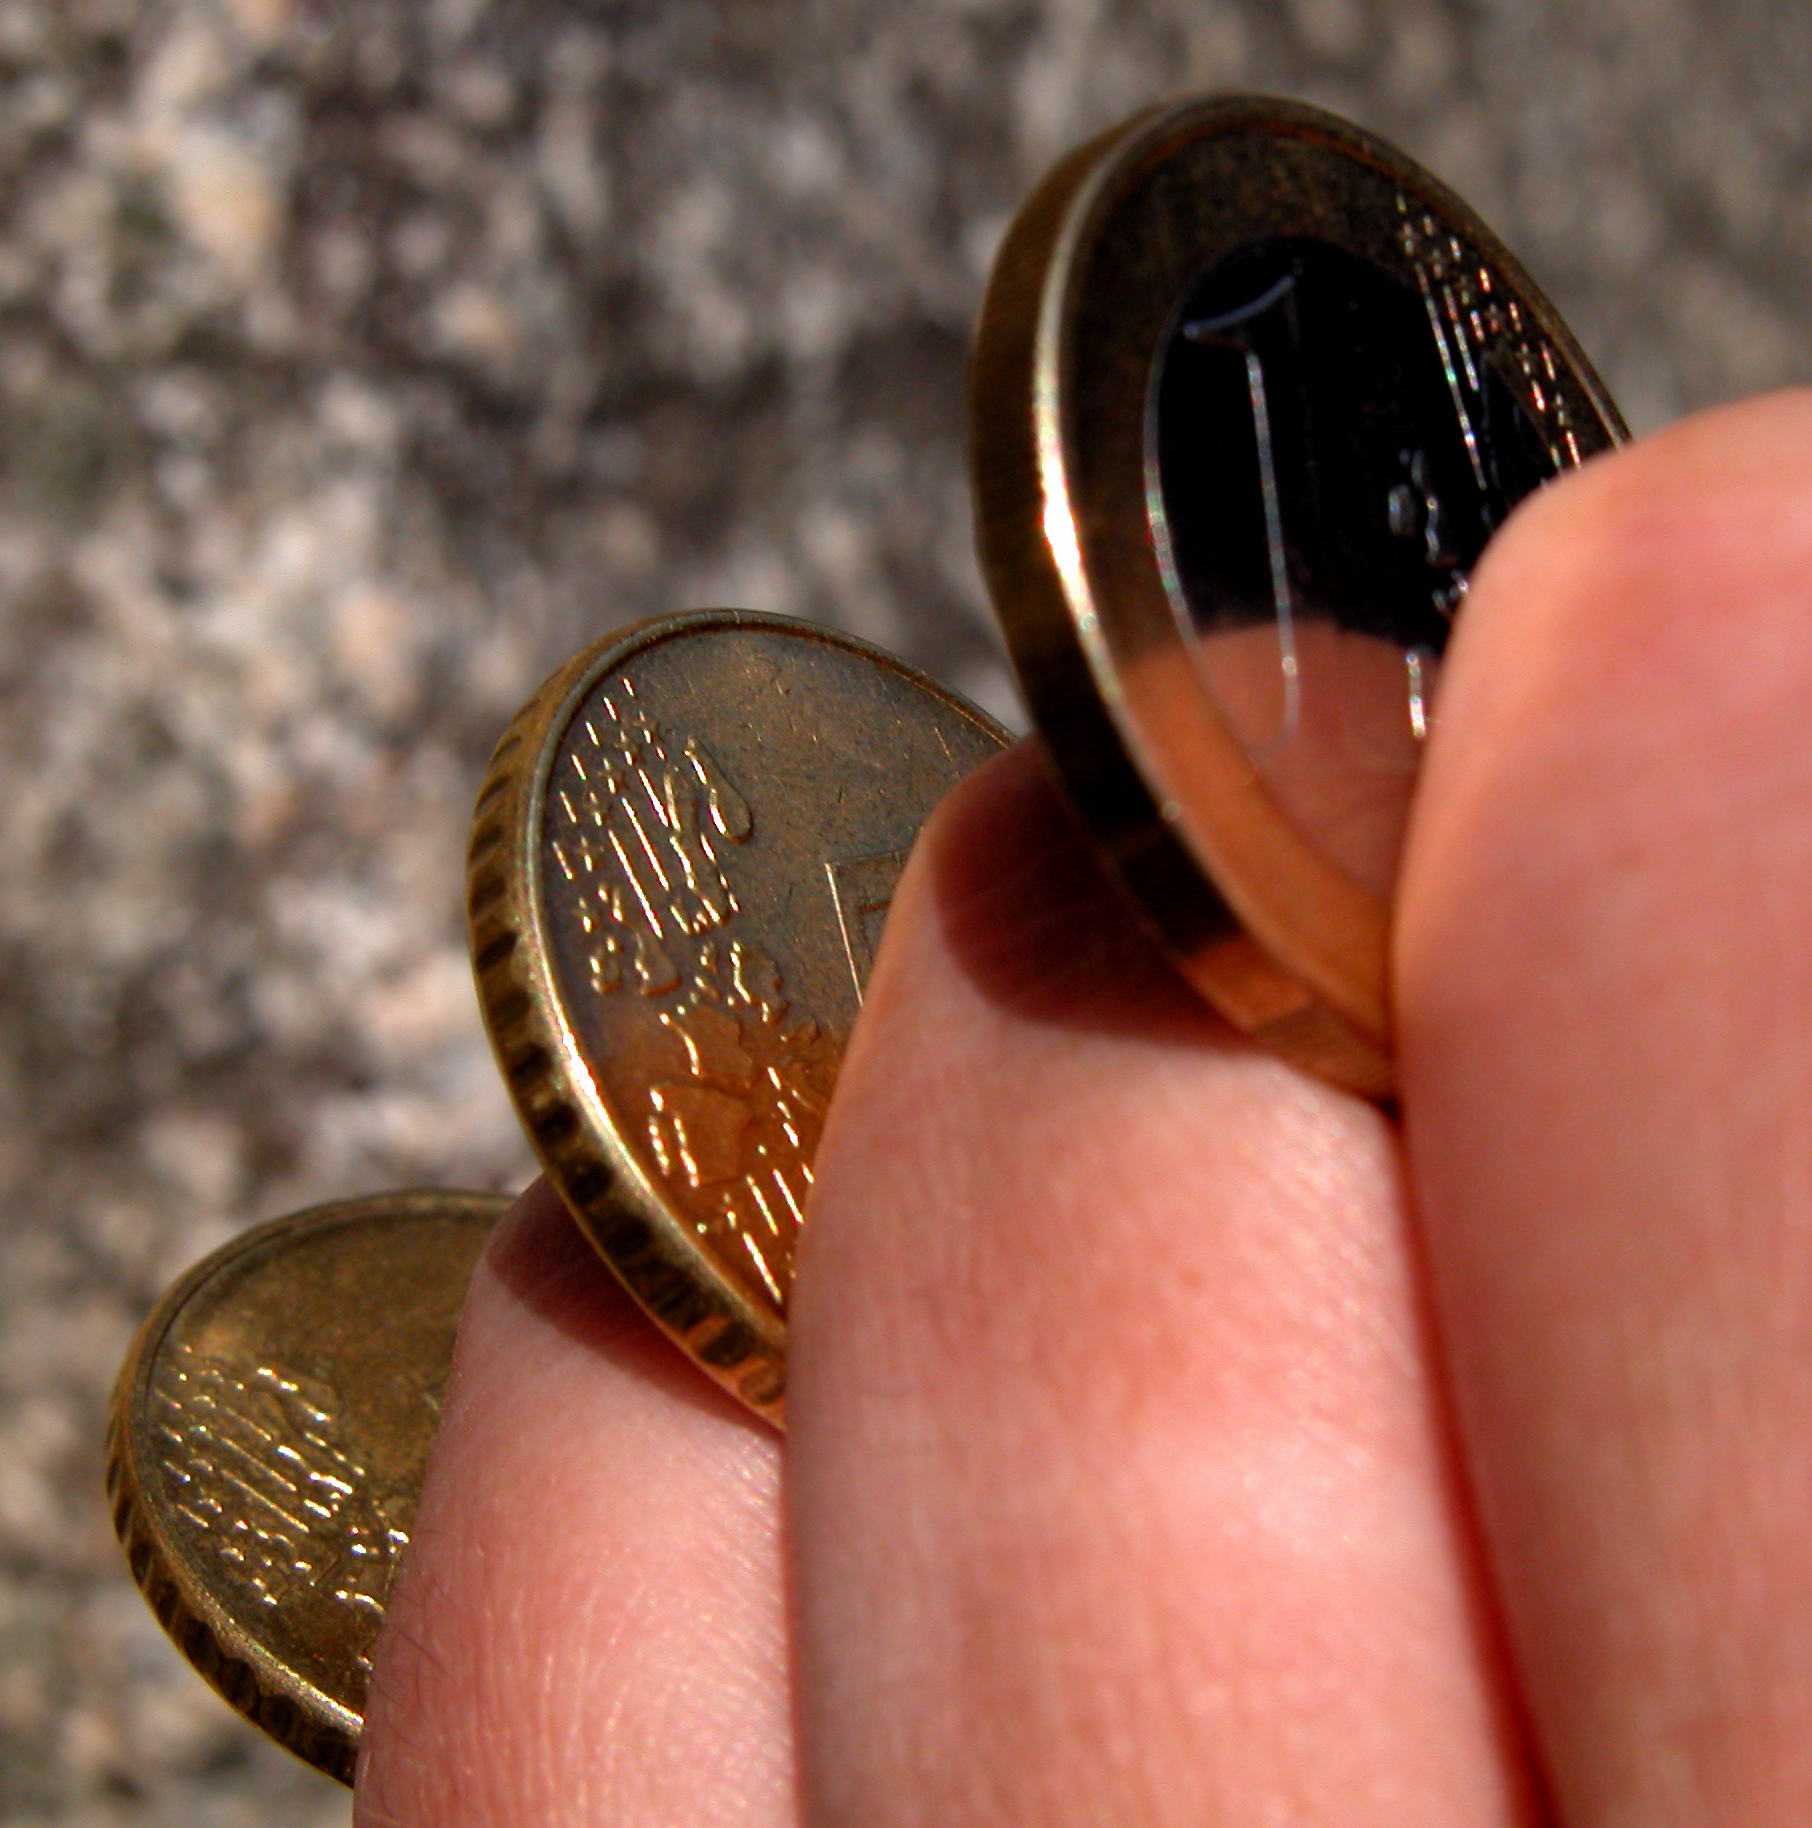 Händlerentgelte bei girocard-Zahlungen optional